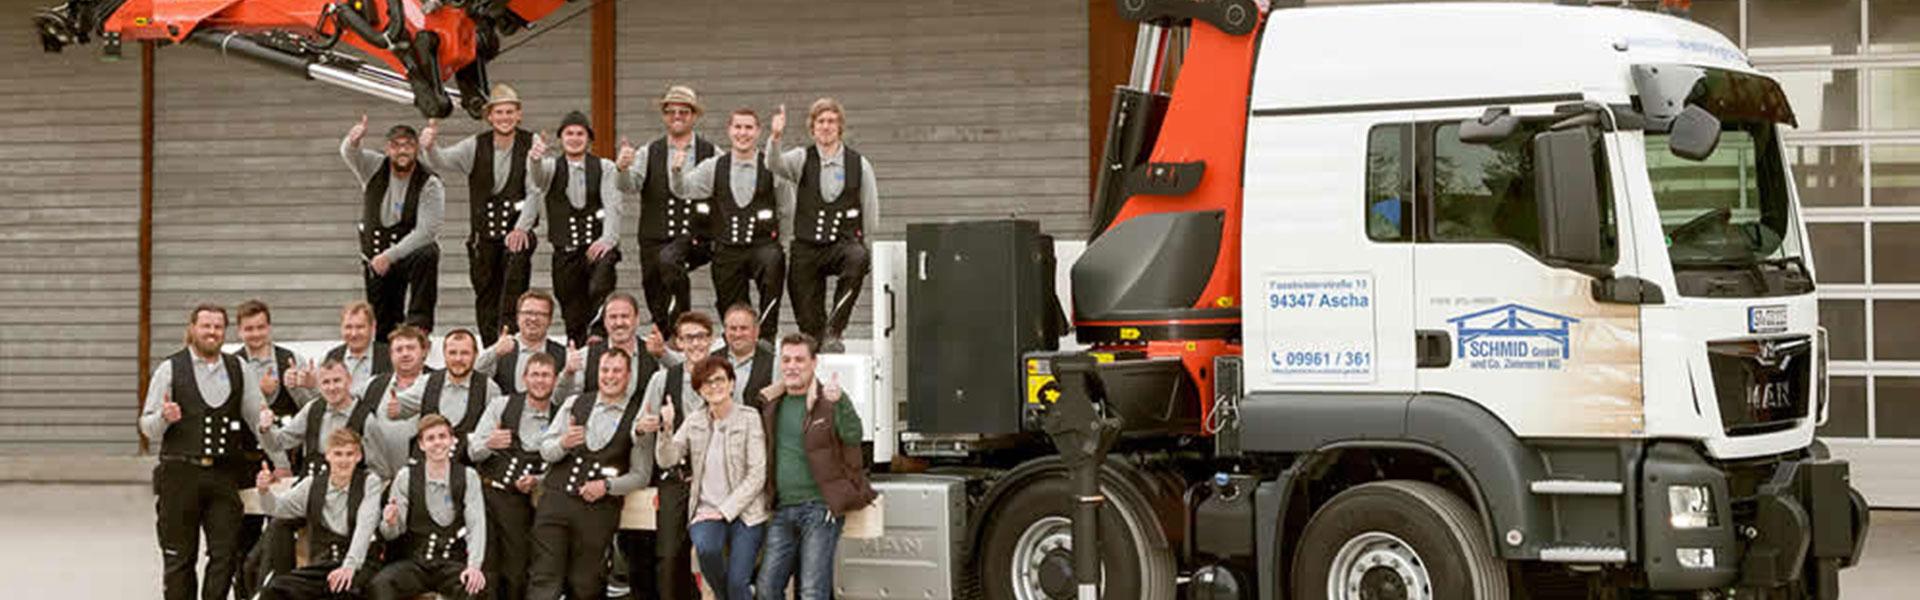 Schmid GmbH & Co. Zimmerei KG in Ascha